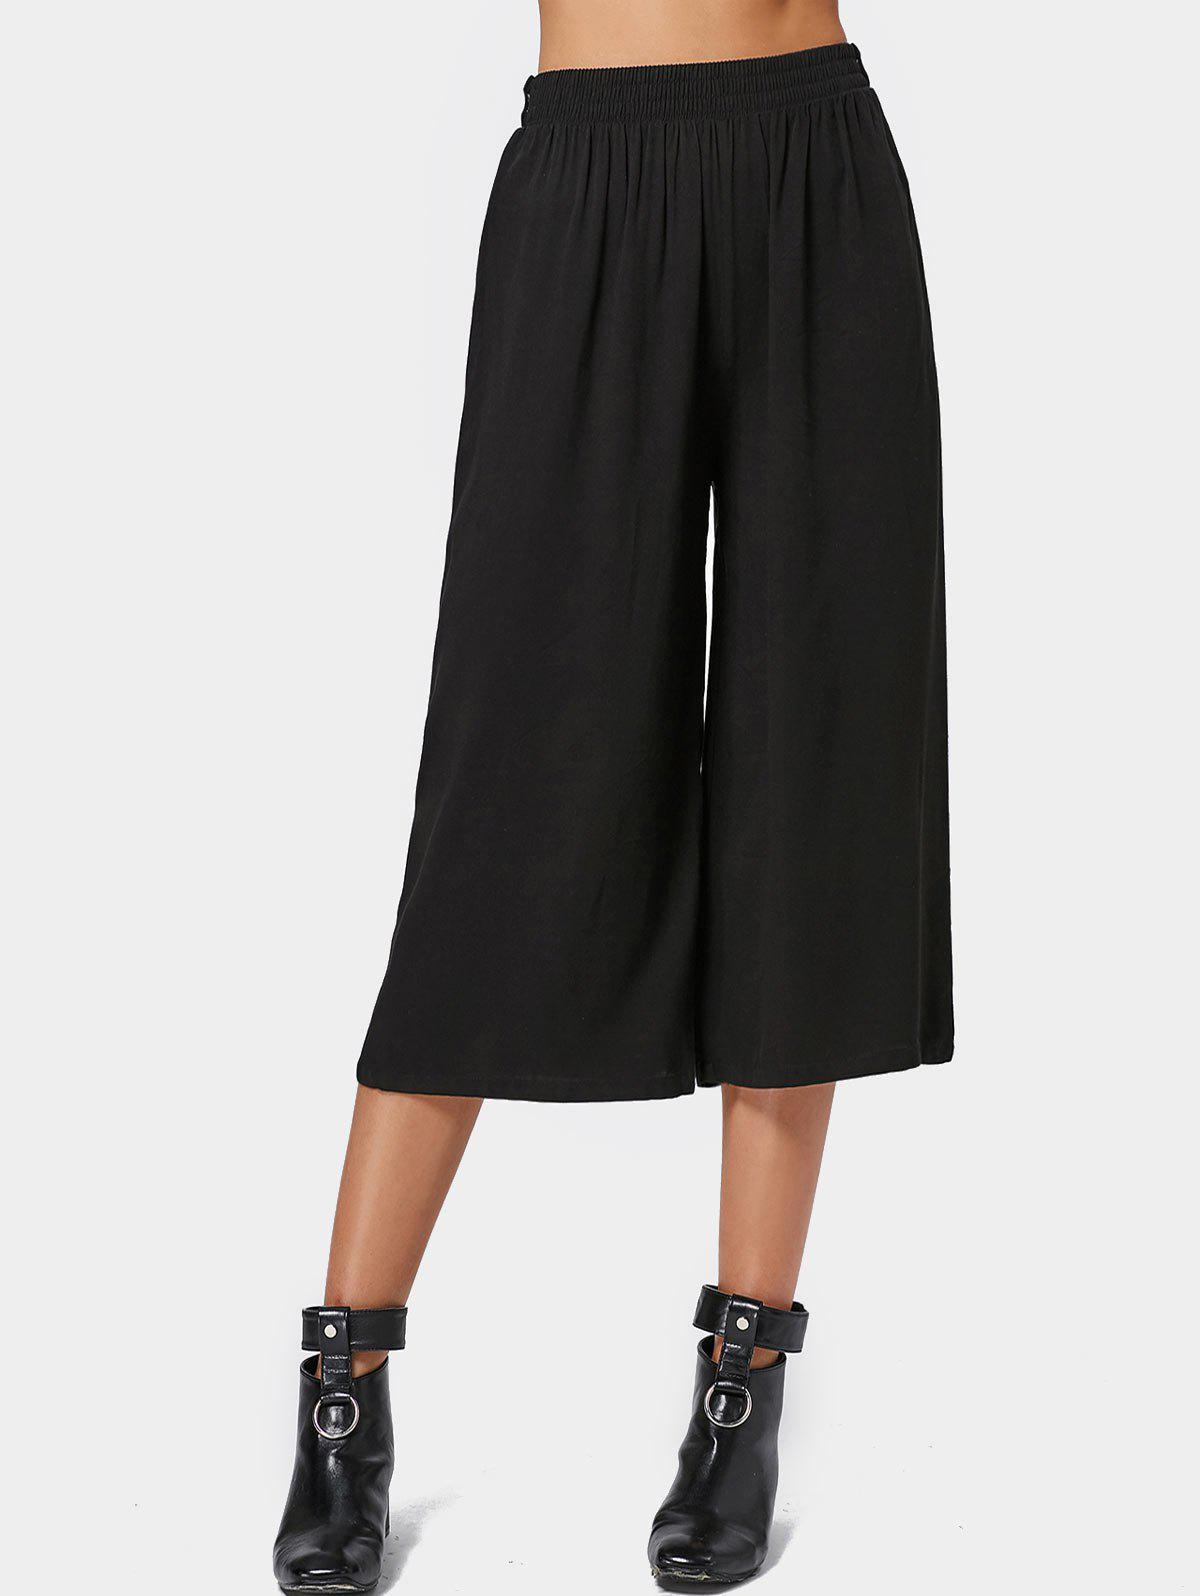 Capri High Waisted Belted Wide Leg Pants 222897204